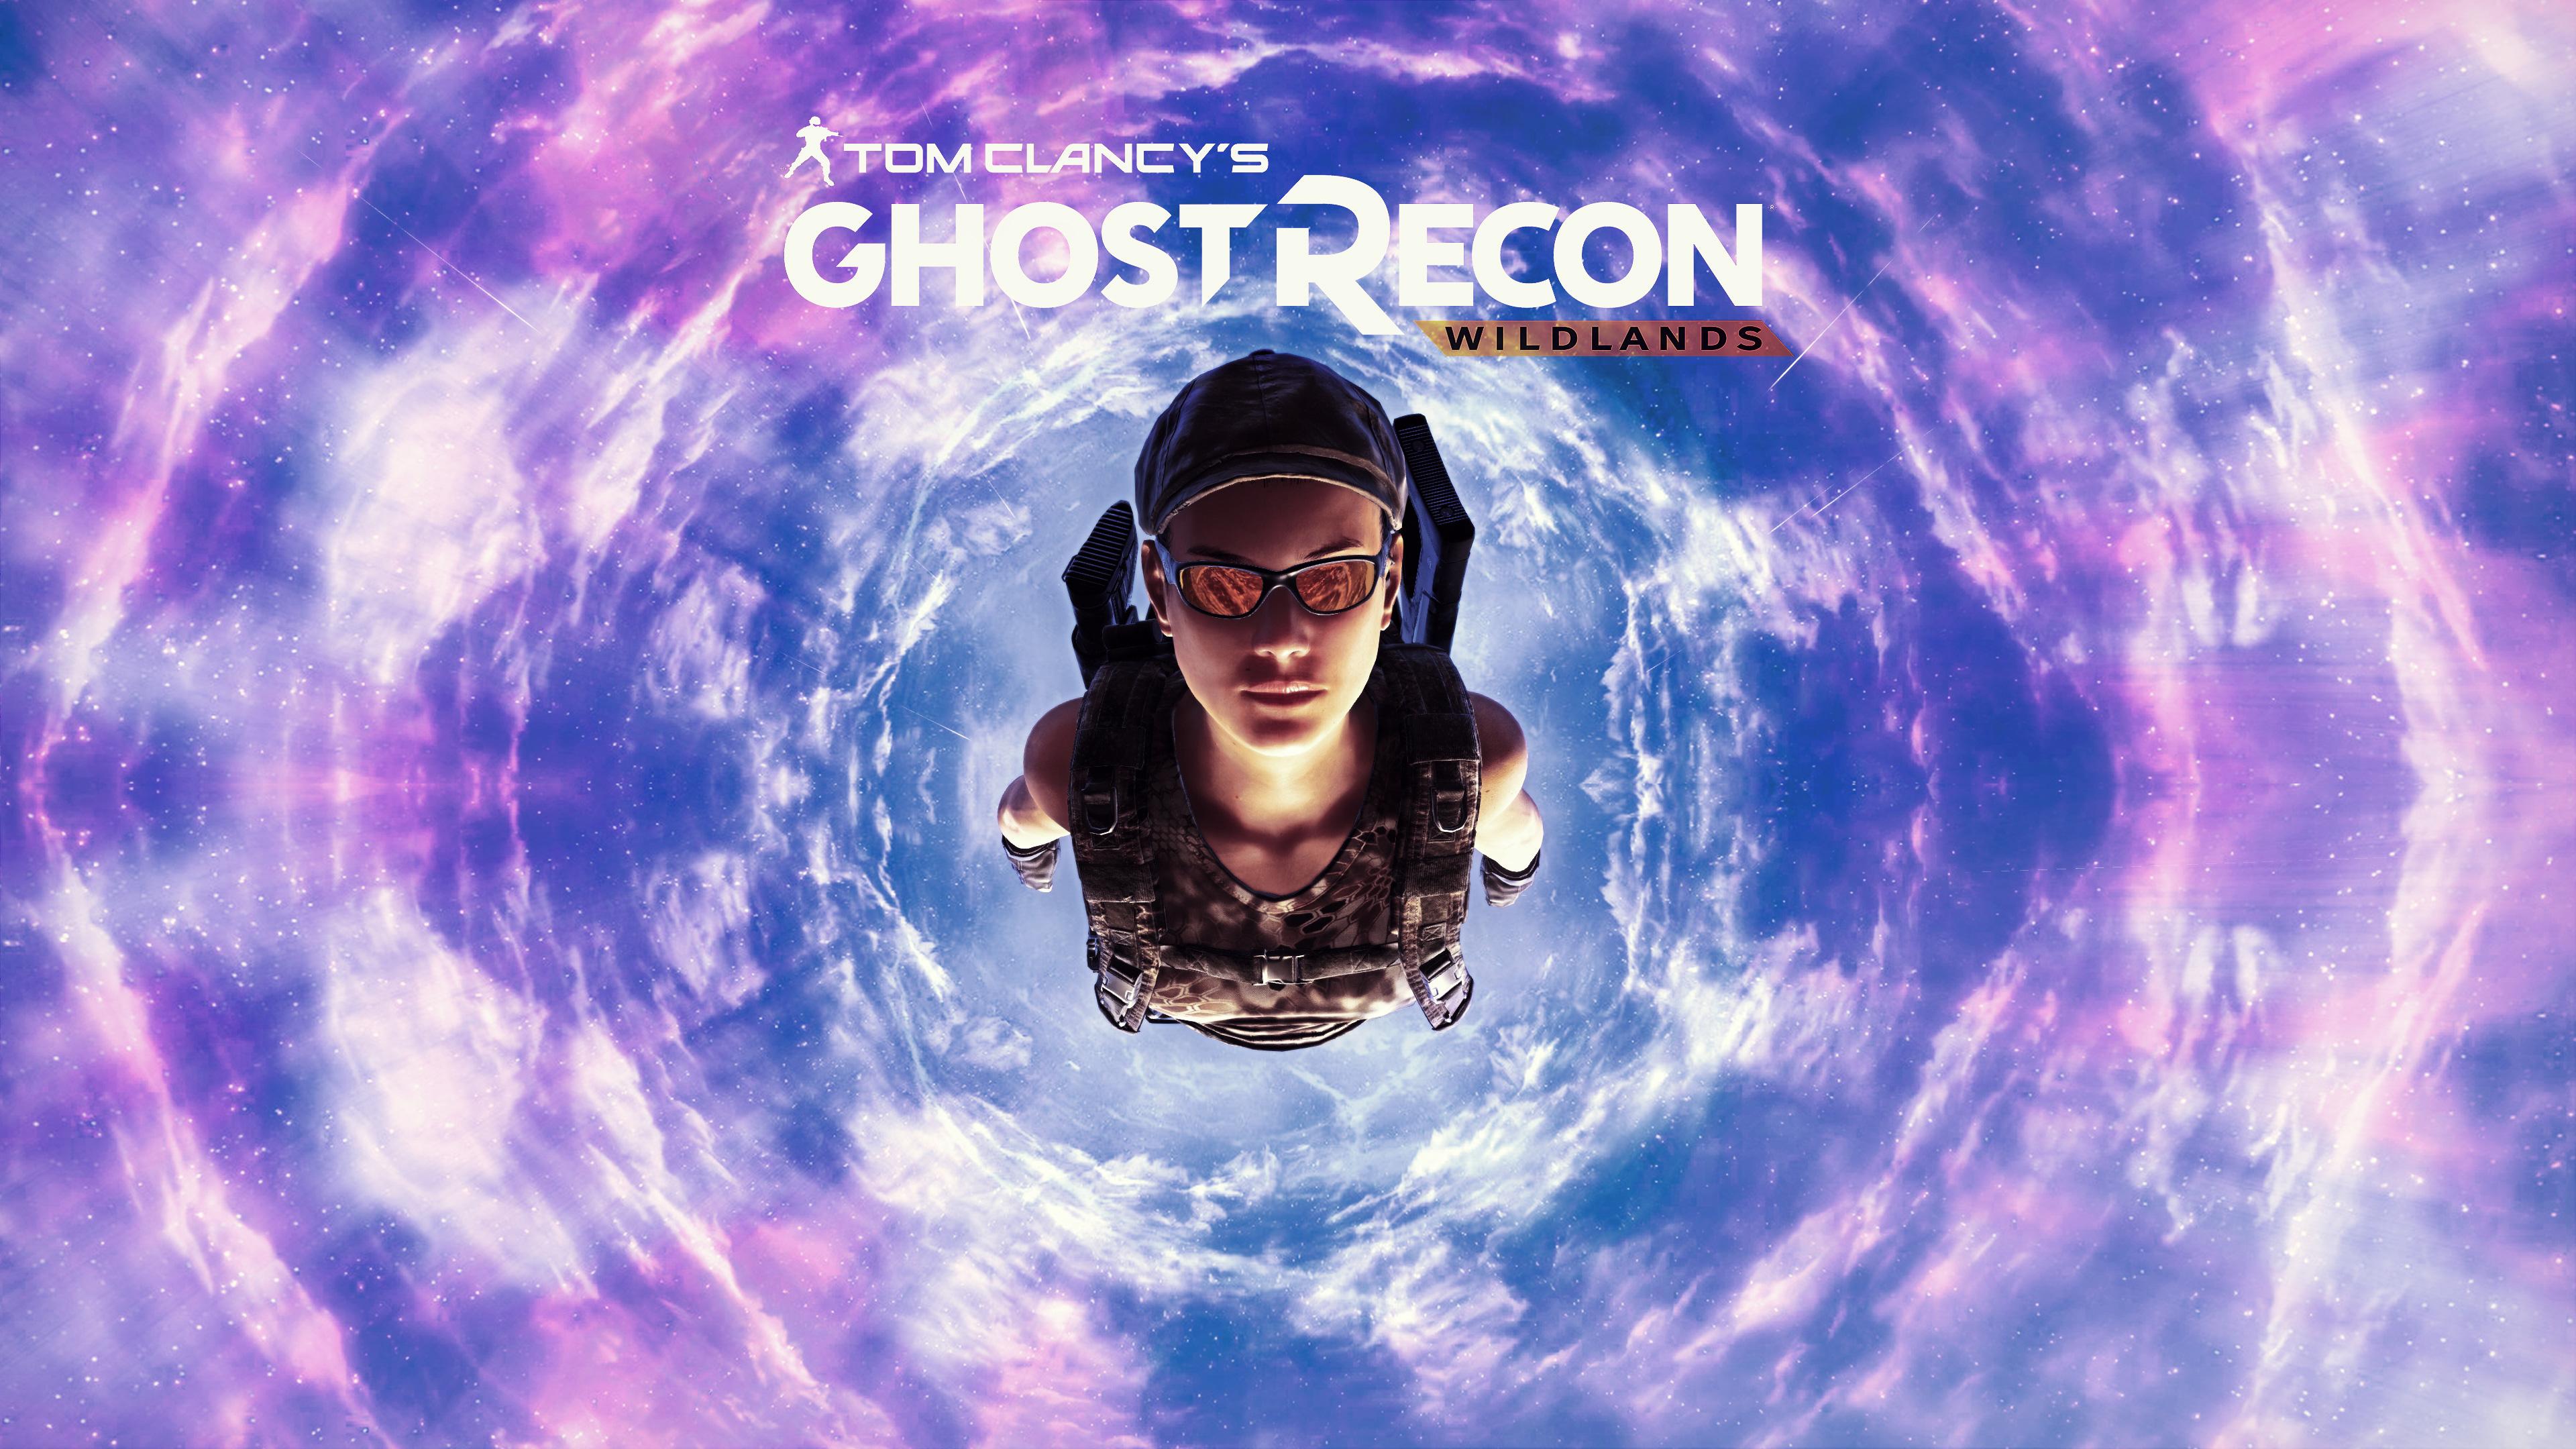 Ghost Recon Wildlands Skydiving 4k Wallpapers Hd Wallpapers